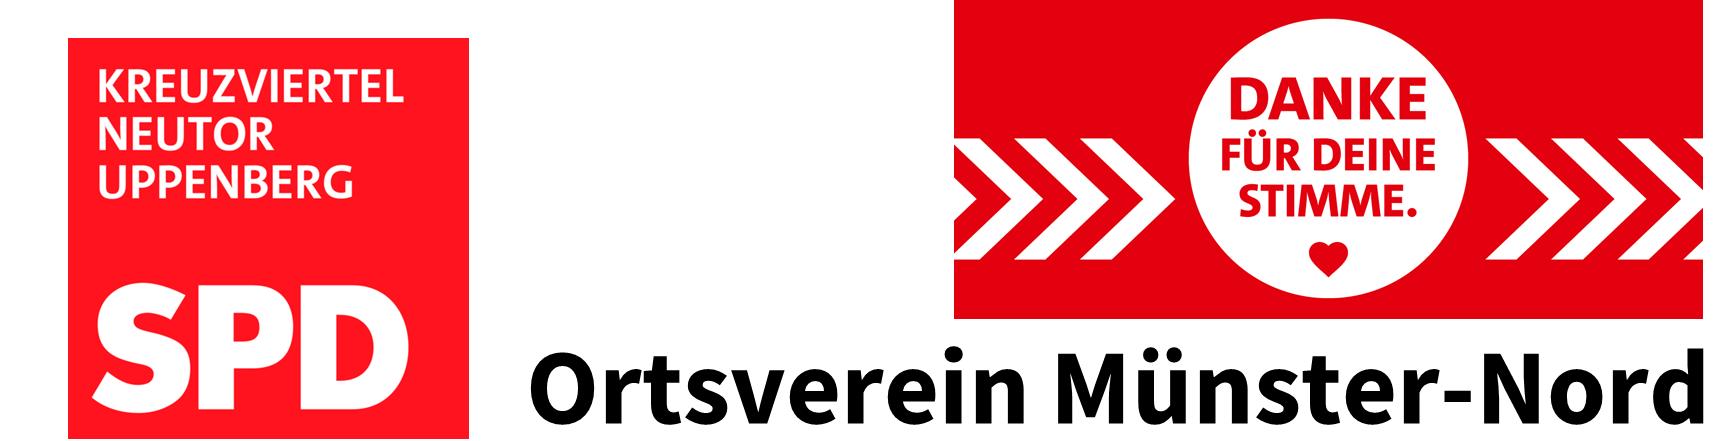 SPD Kreuzviertel. Neutor. Uppenberg.